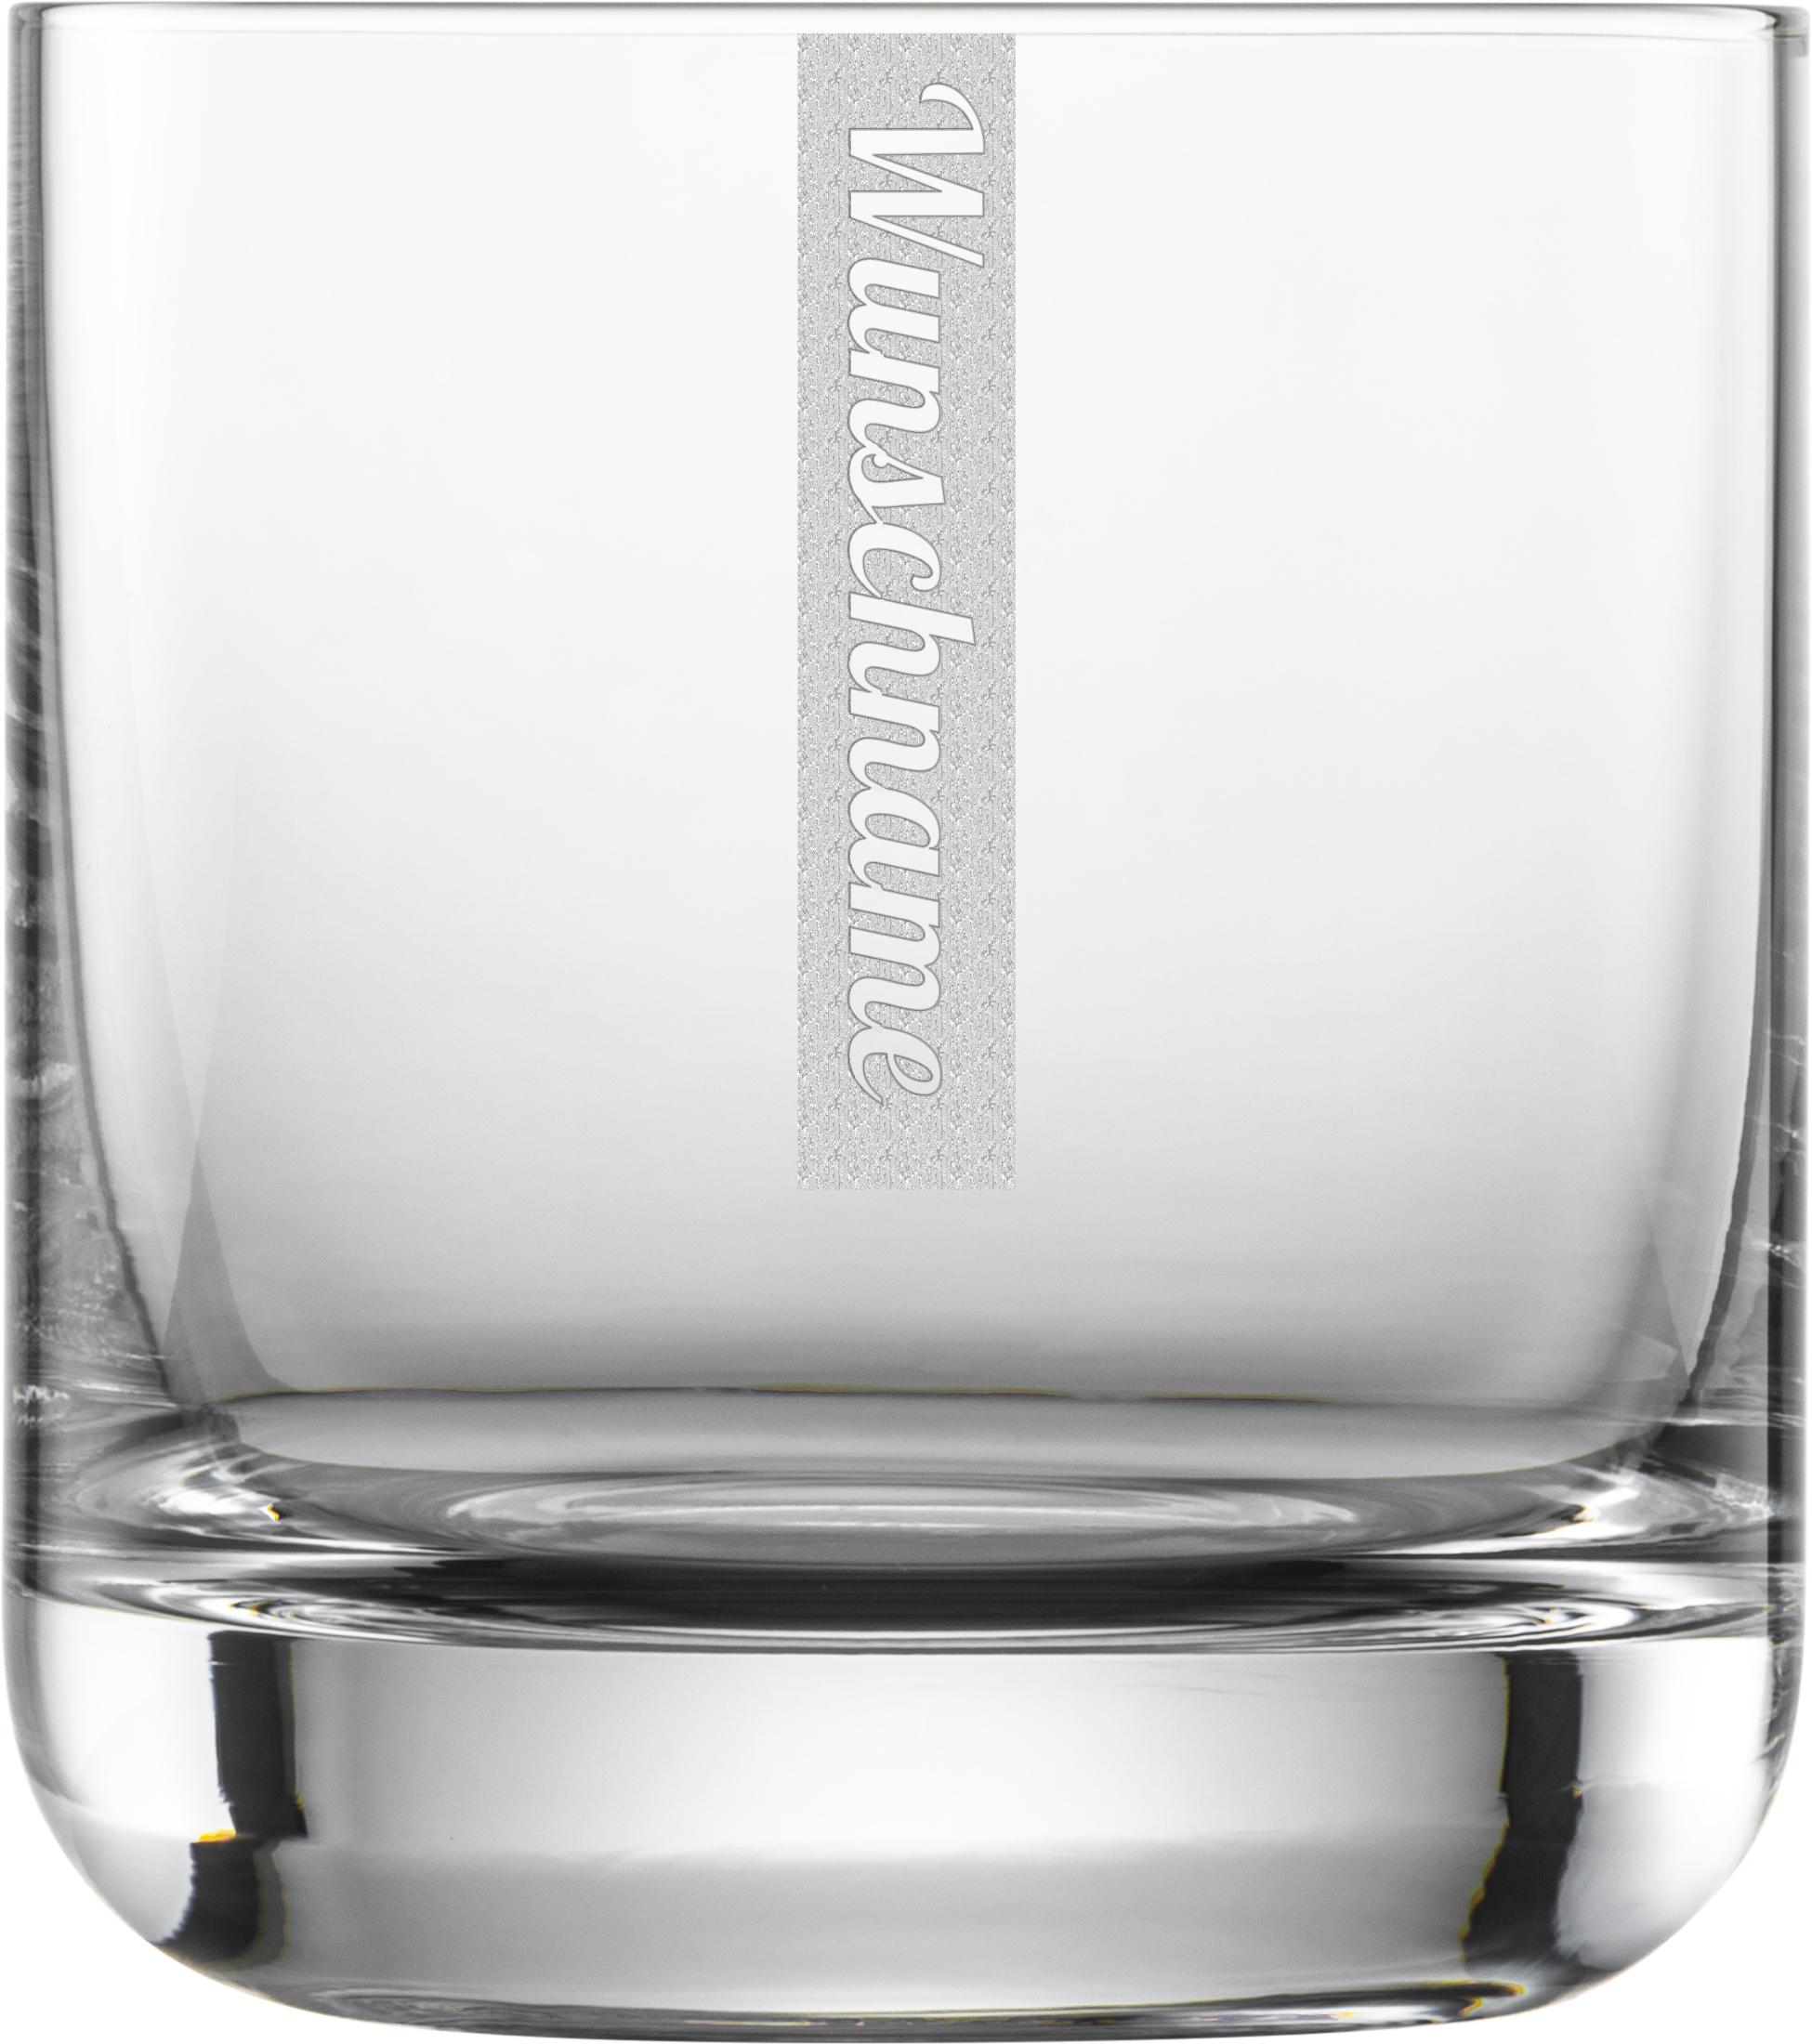 NAMEN Whiskyglas mit Wunschtext | Schott 300ml Tumbler | Gravur